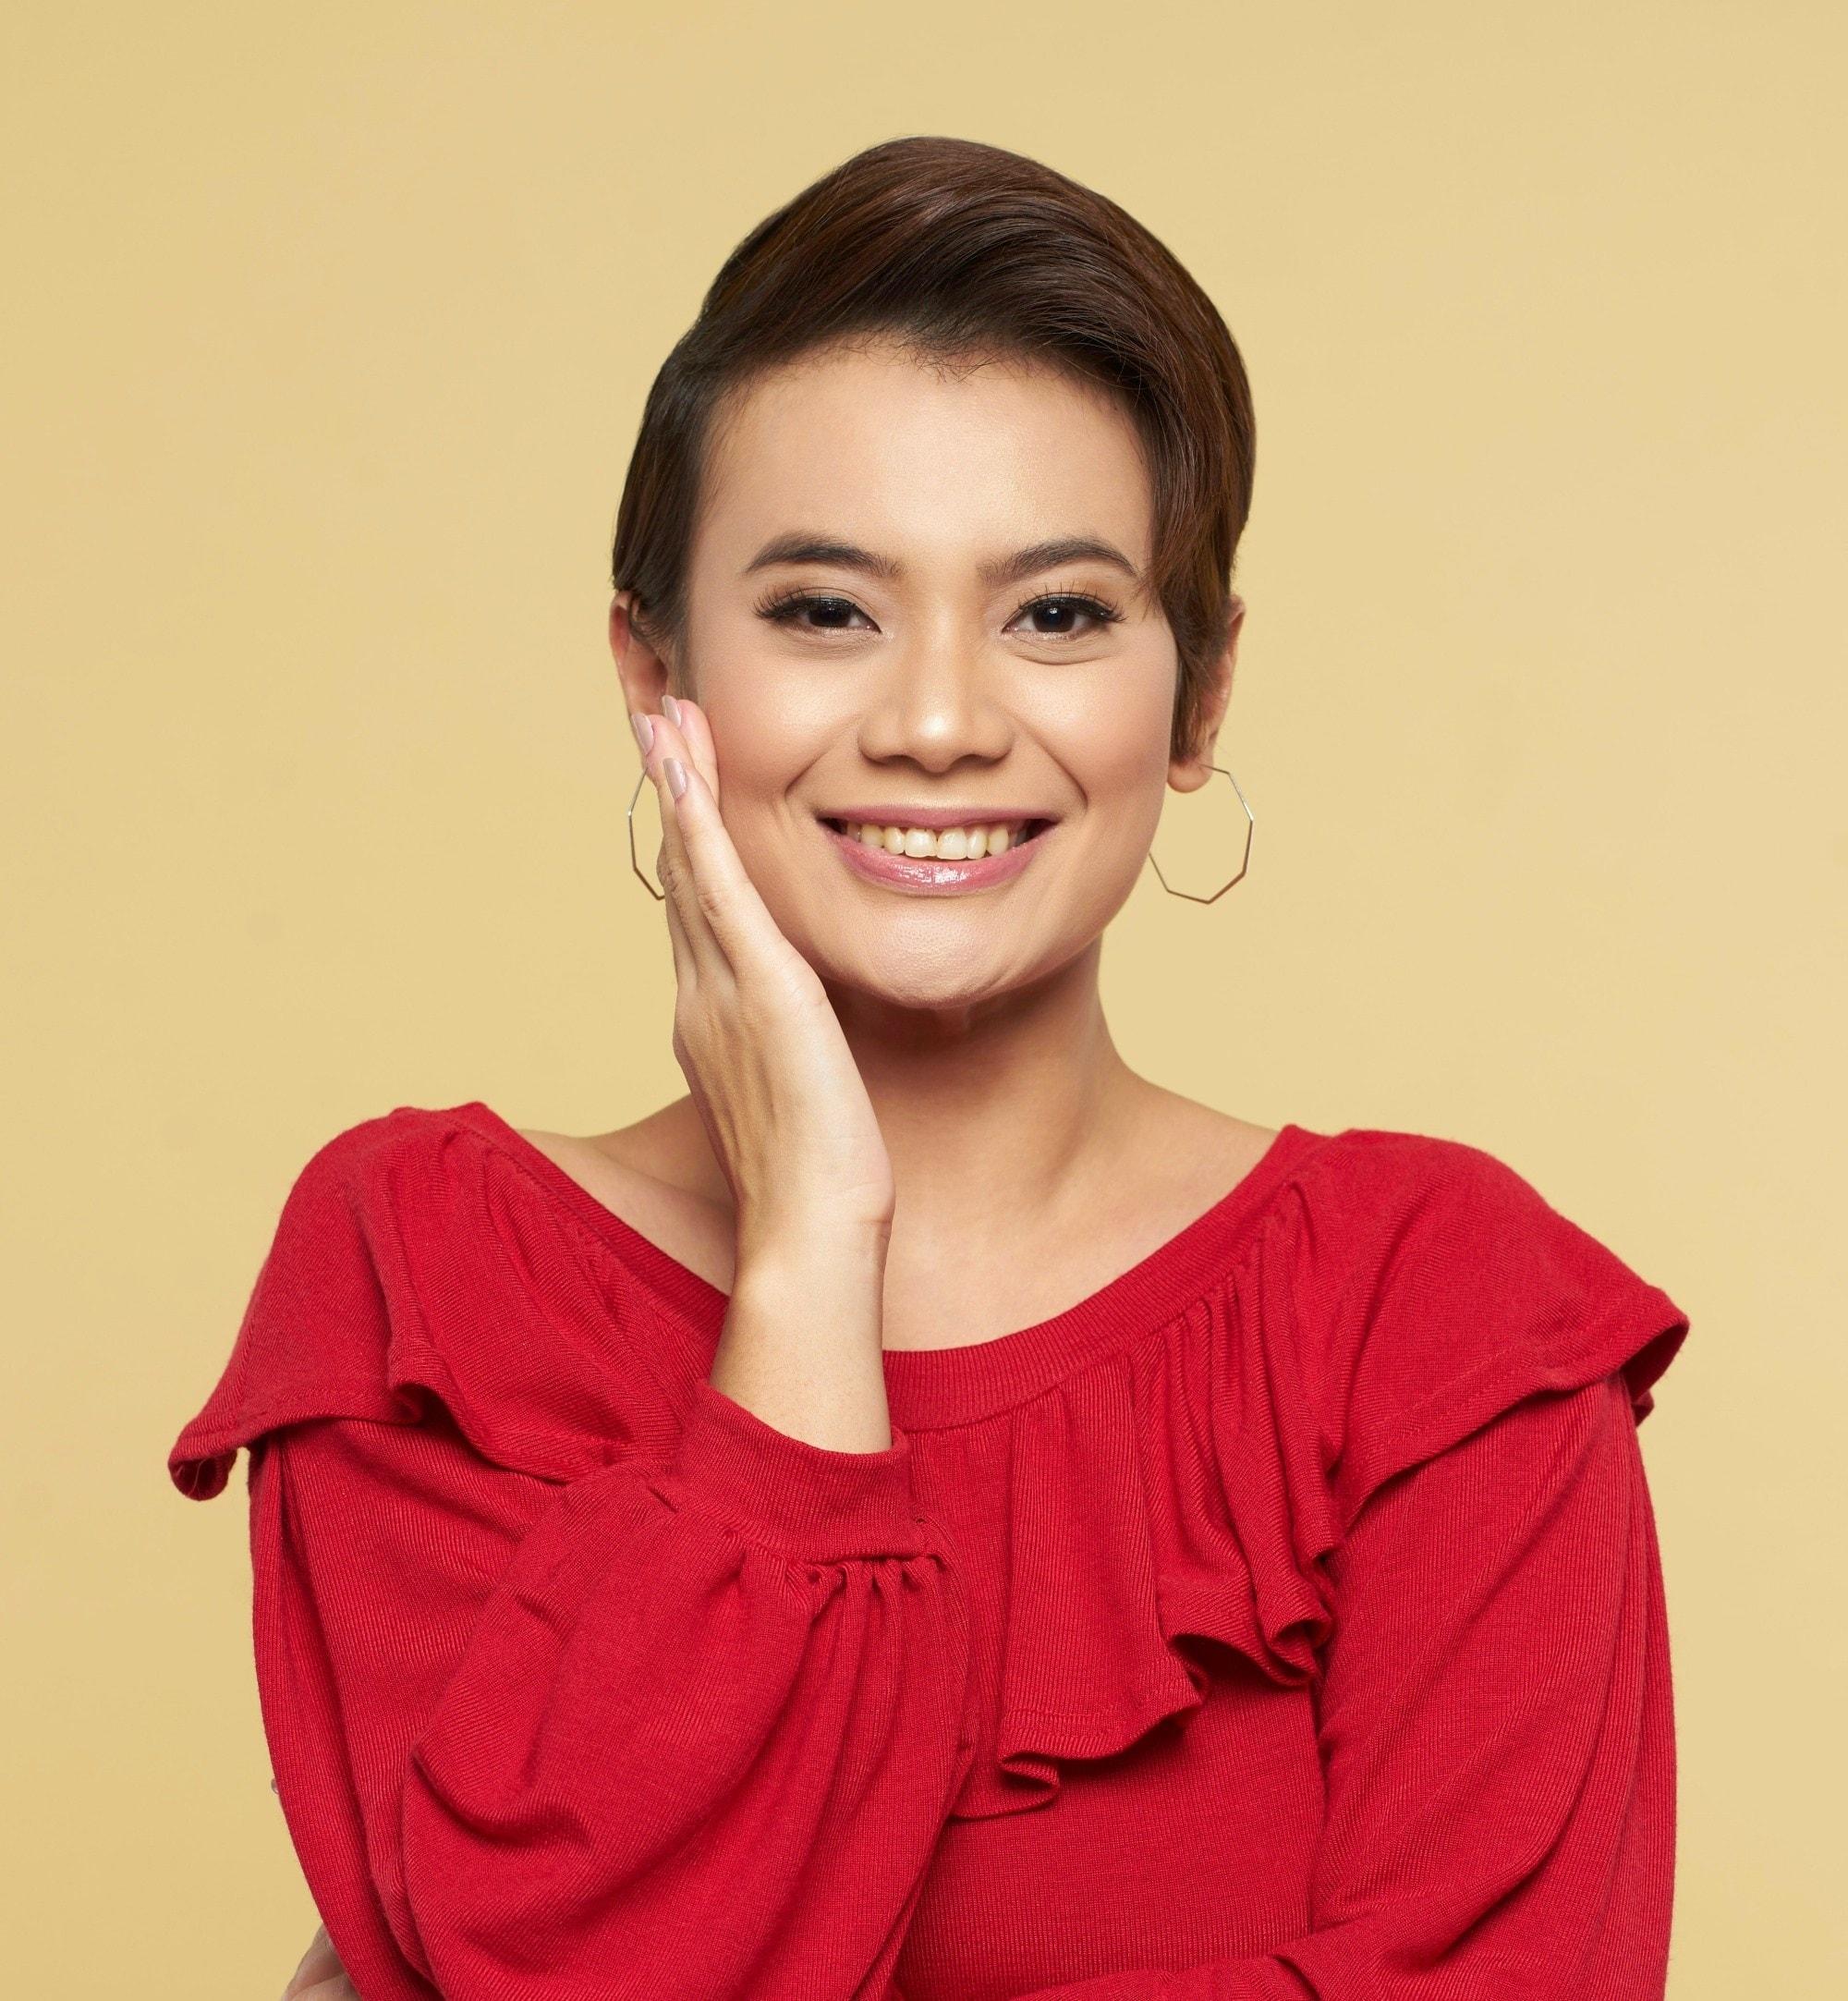 Gorgeous pixie cuts: Closeup shot of an Asian woman with short dark brown hair smiling